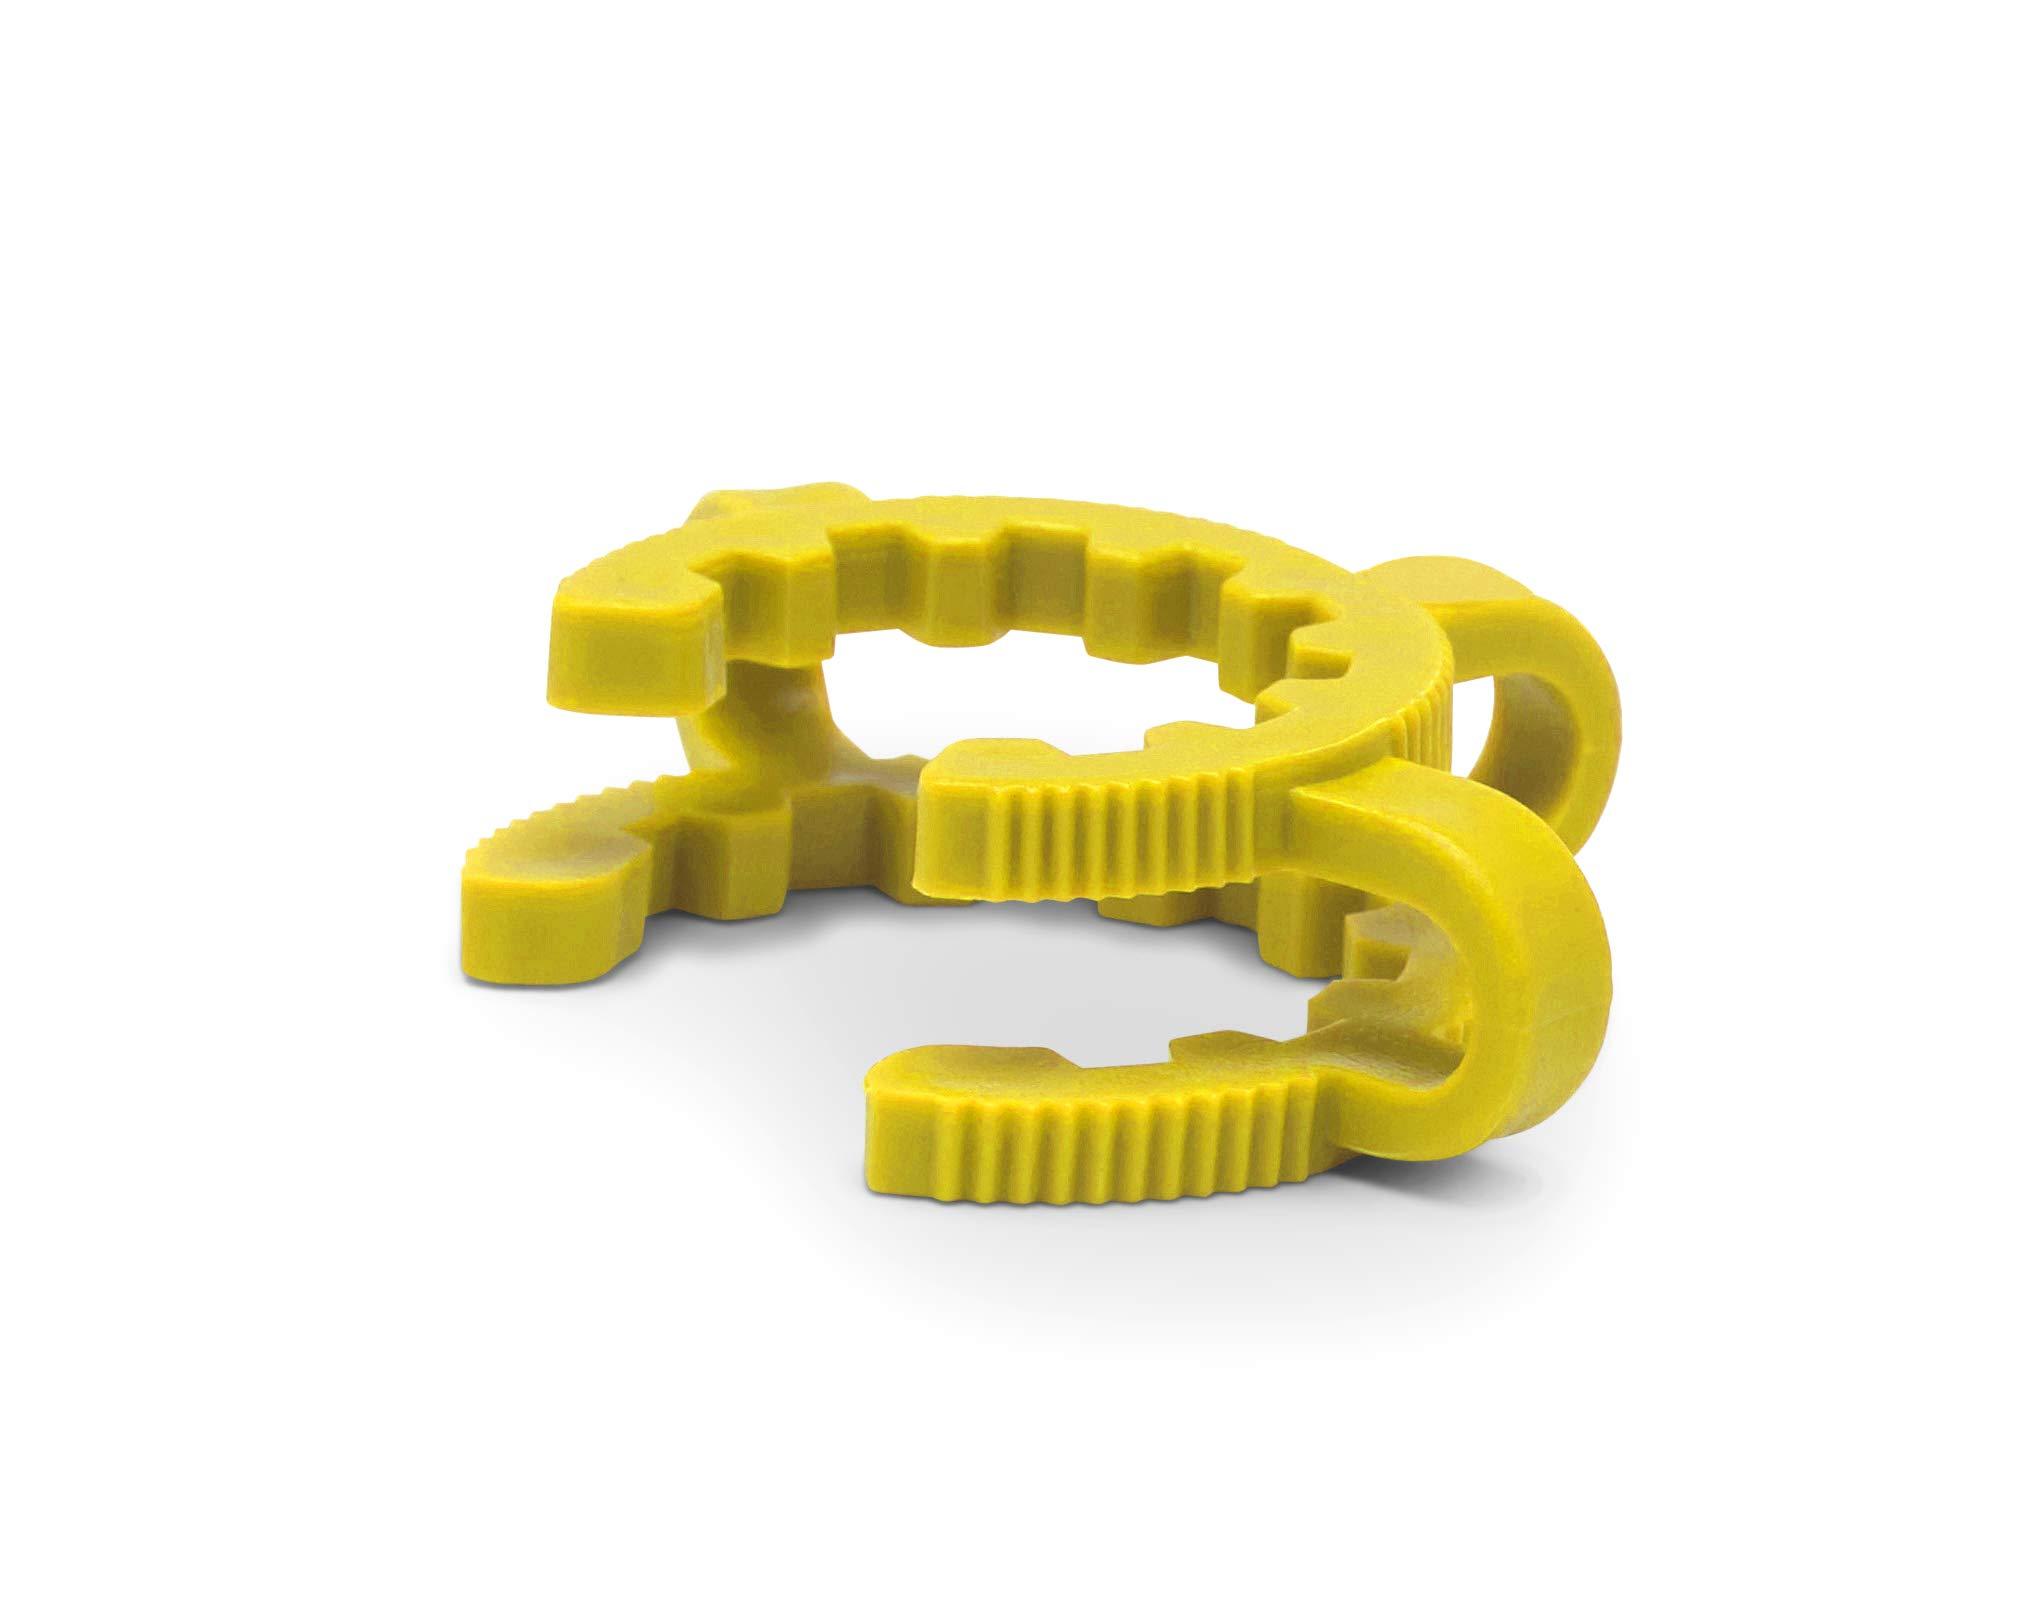 Goldleaf Scientific ACC040PK #40 Plastic Keck Clips (5-Pack) by Goldleaf Scientific